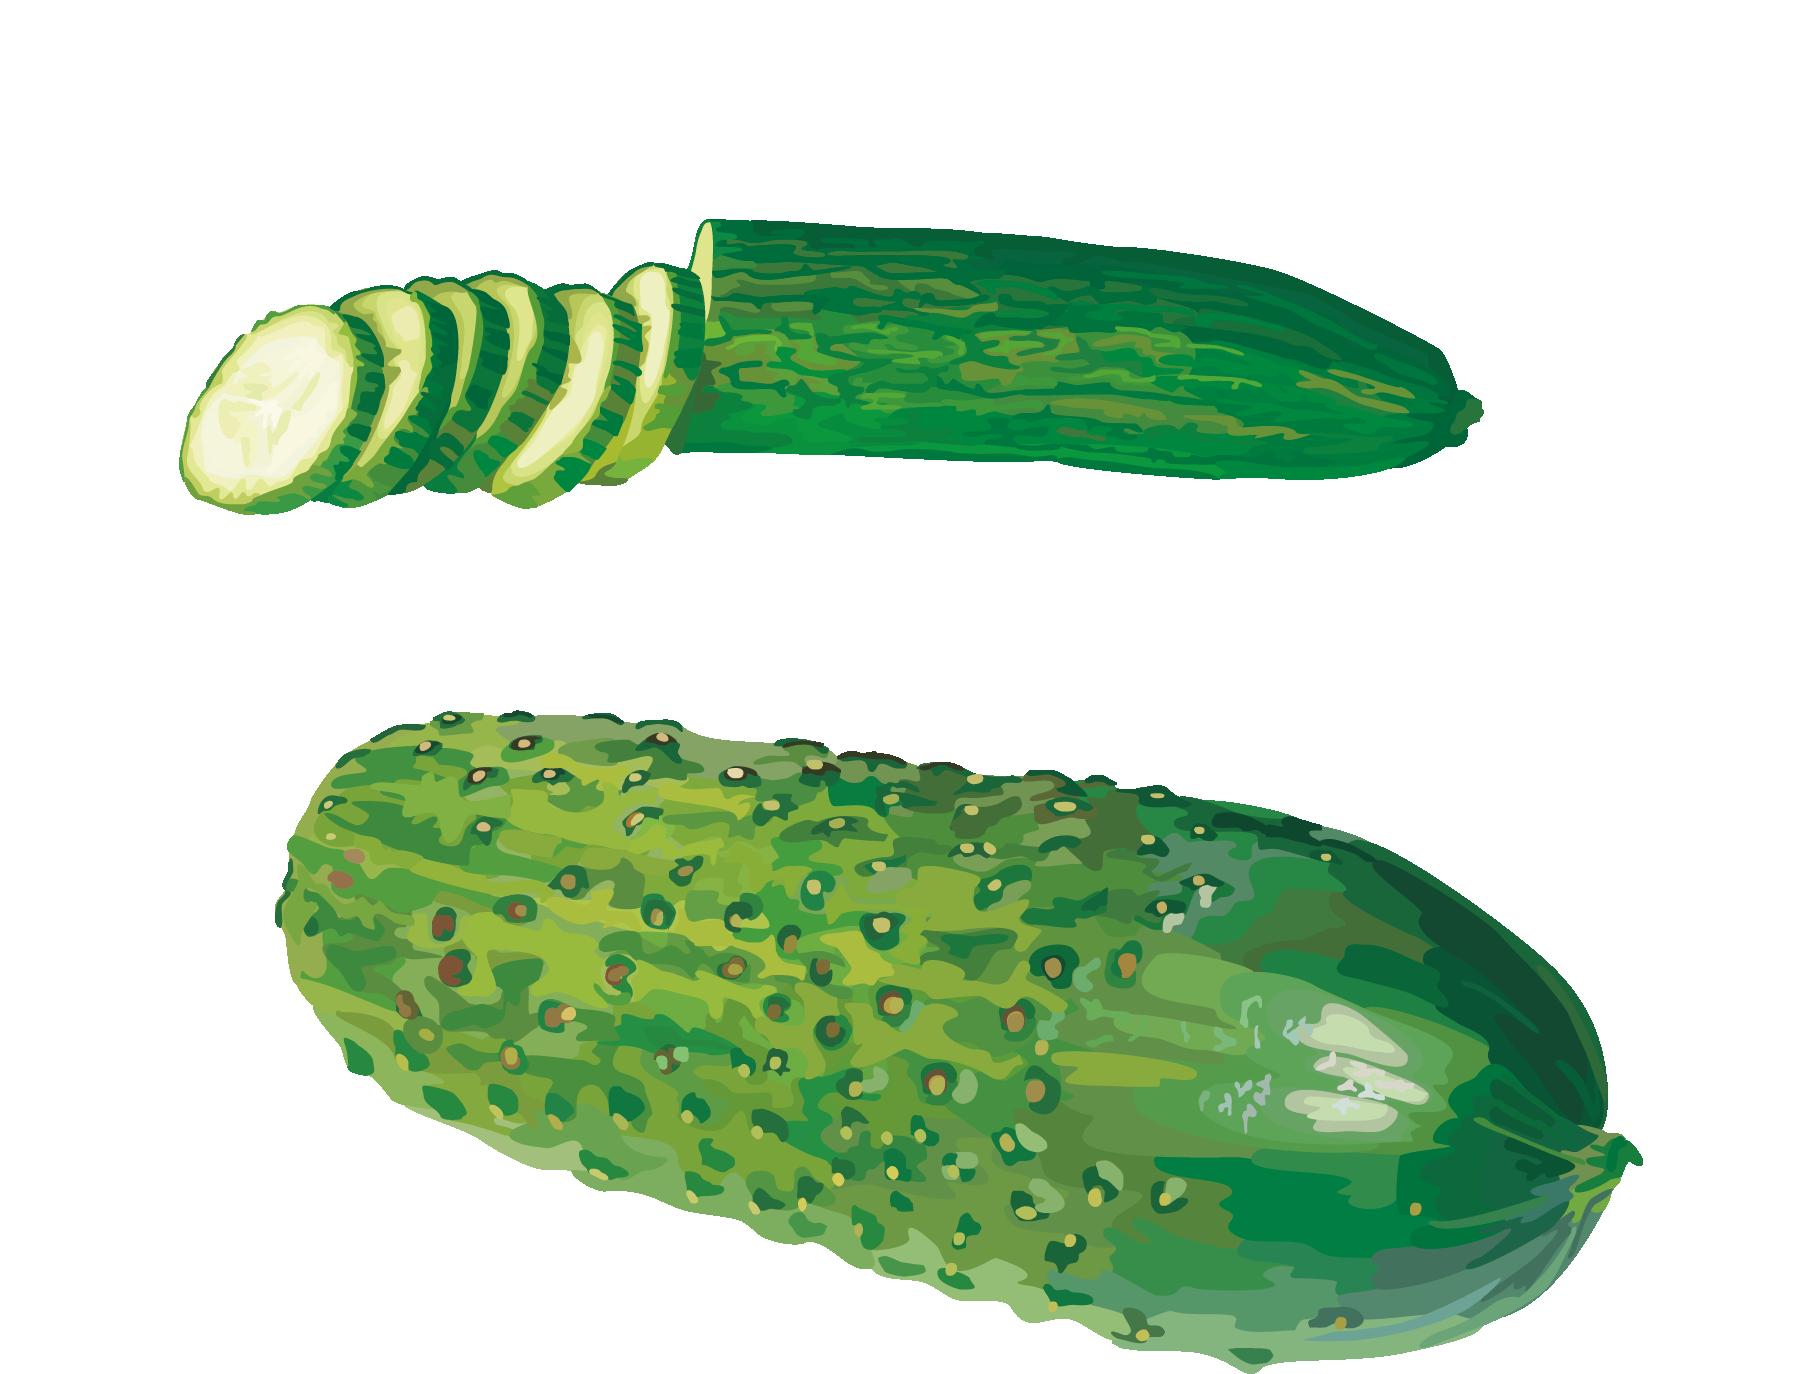 Vegetables clipart cucumber. West indian gherkin vegetable